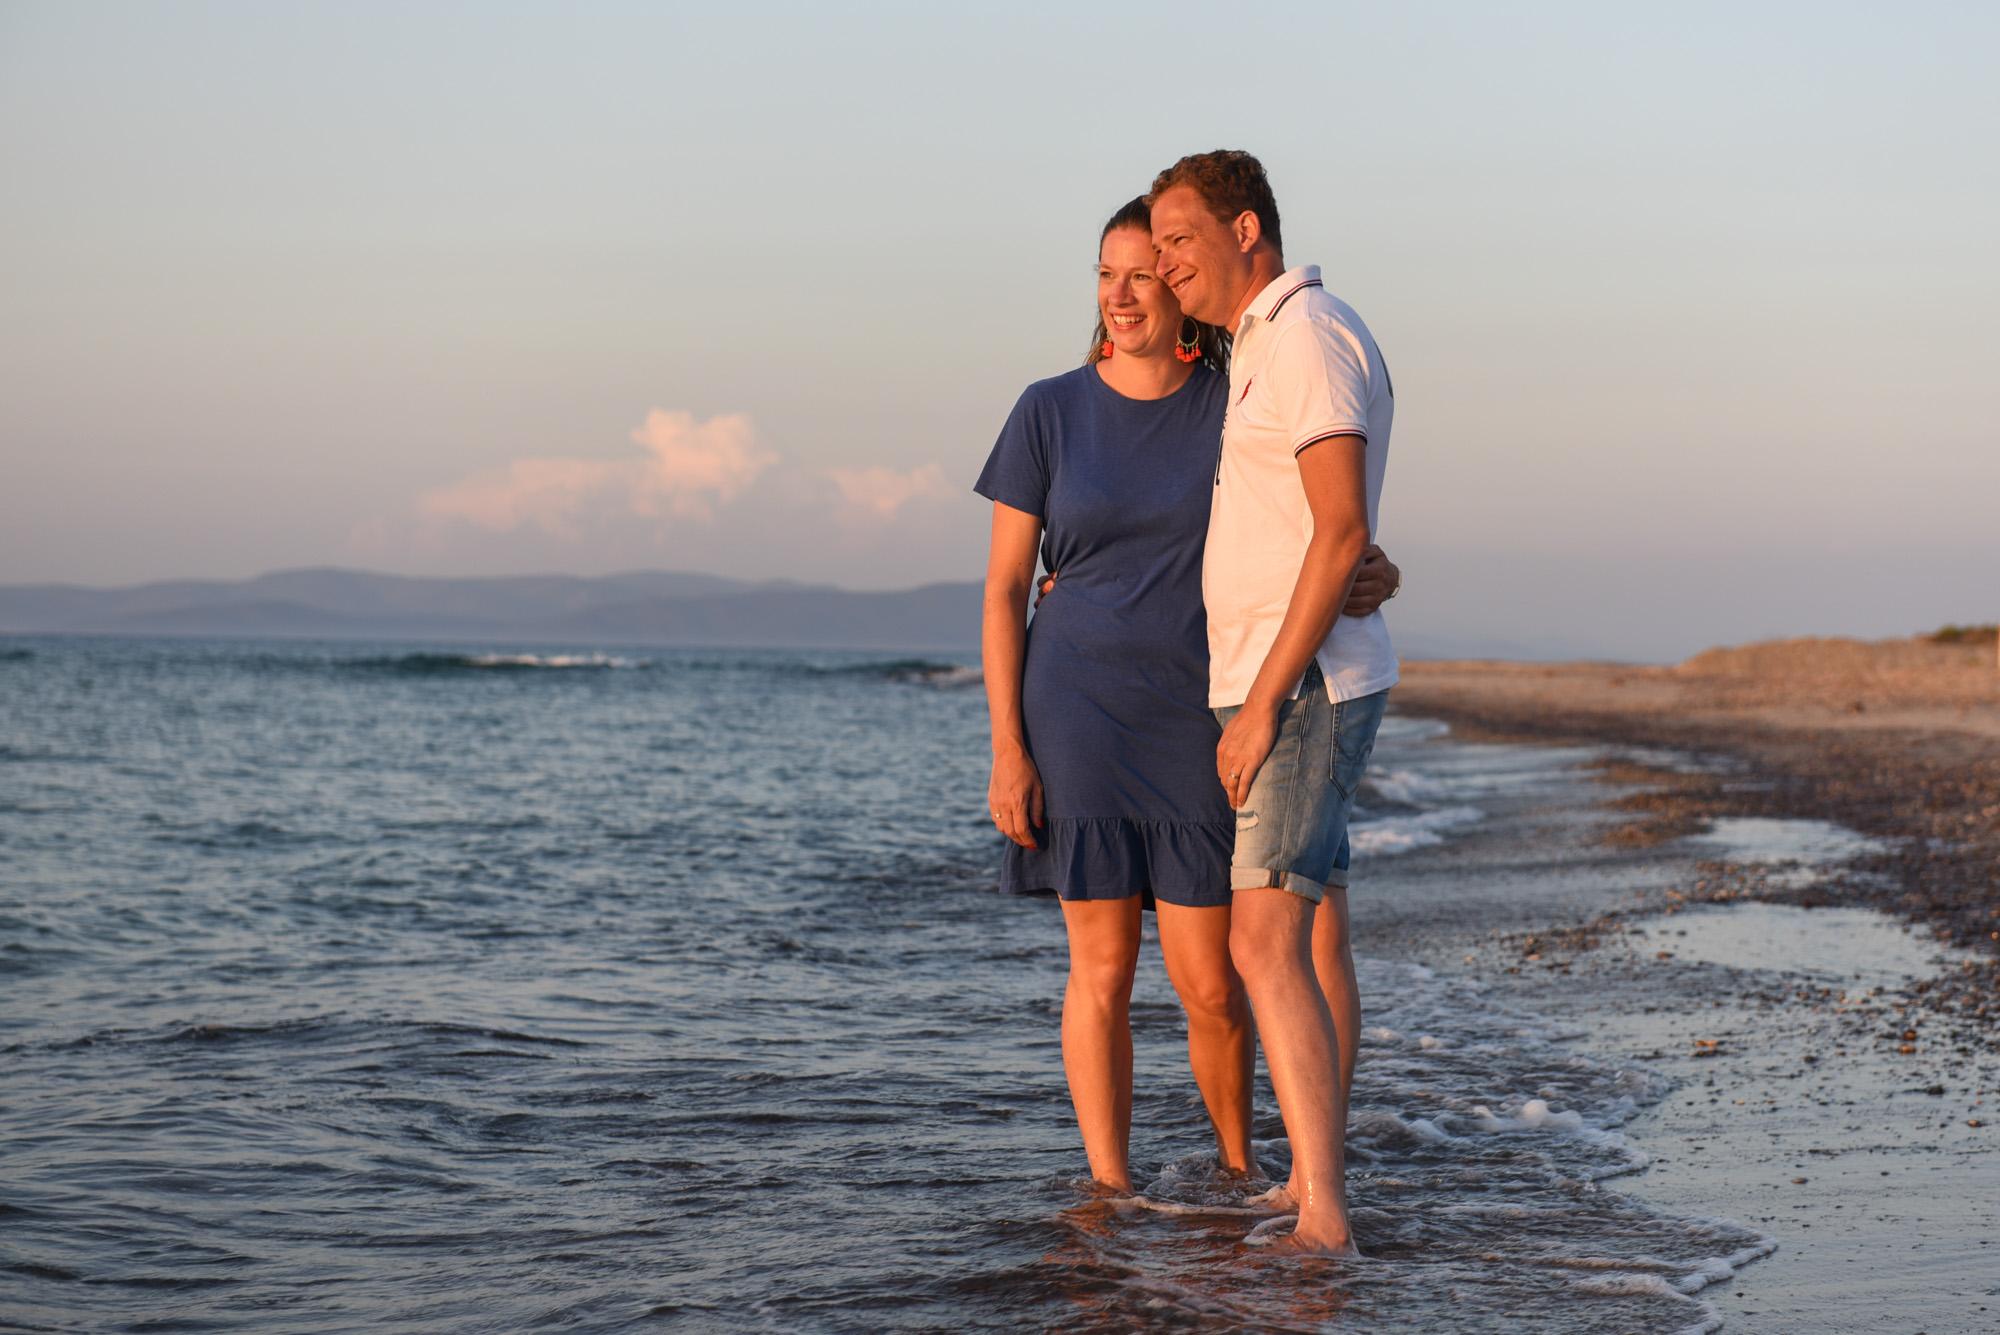 couple photo session on Kos island